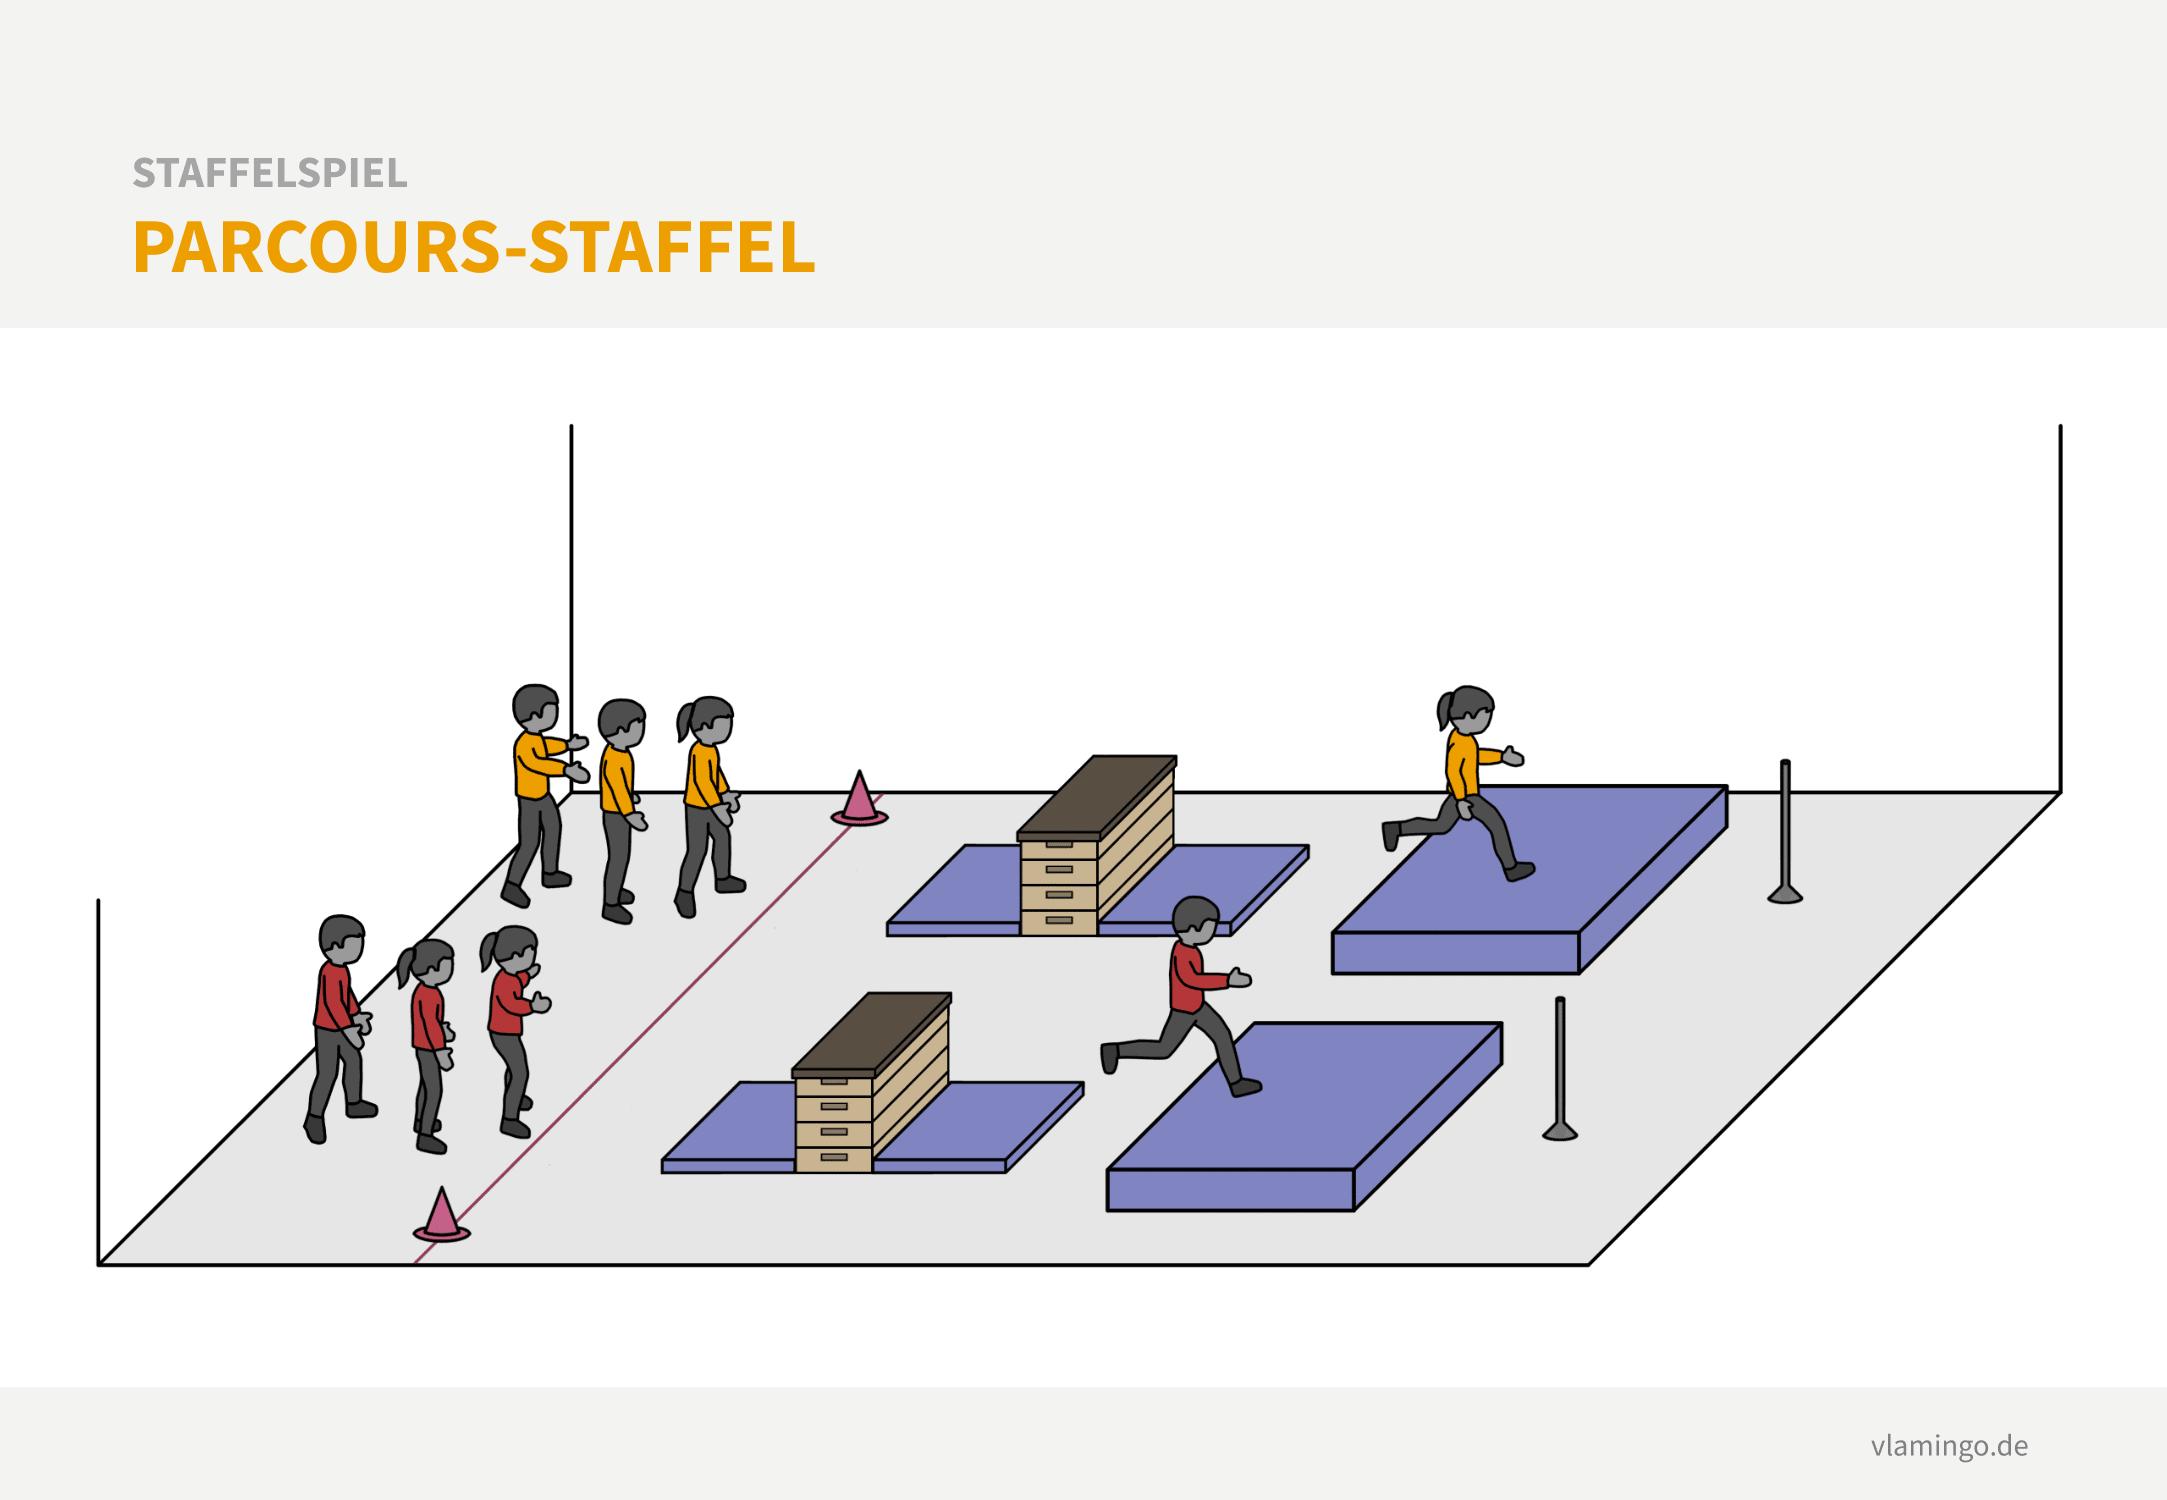 Staffelspiel - Parcours-Staffel